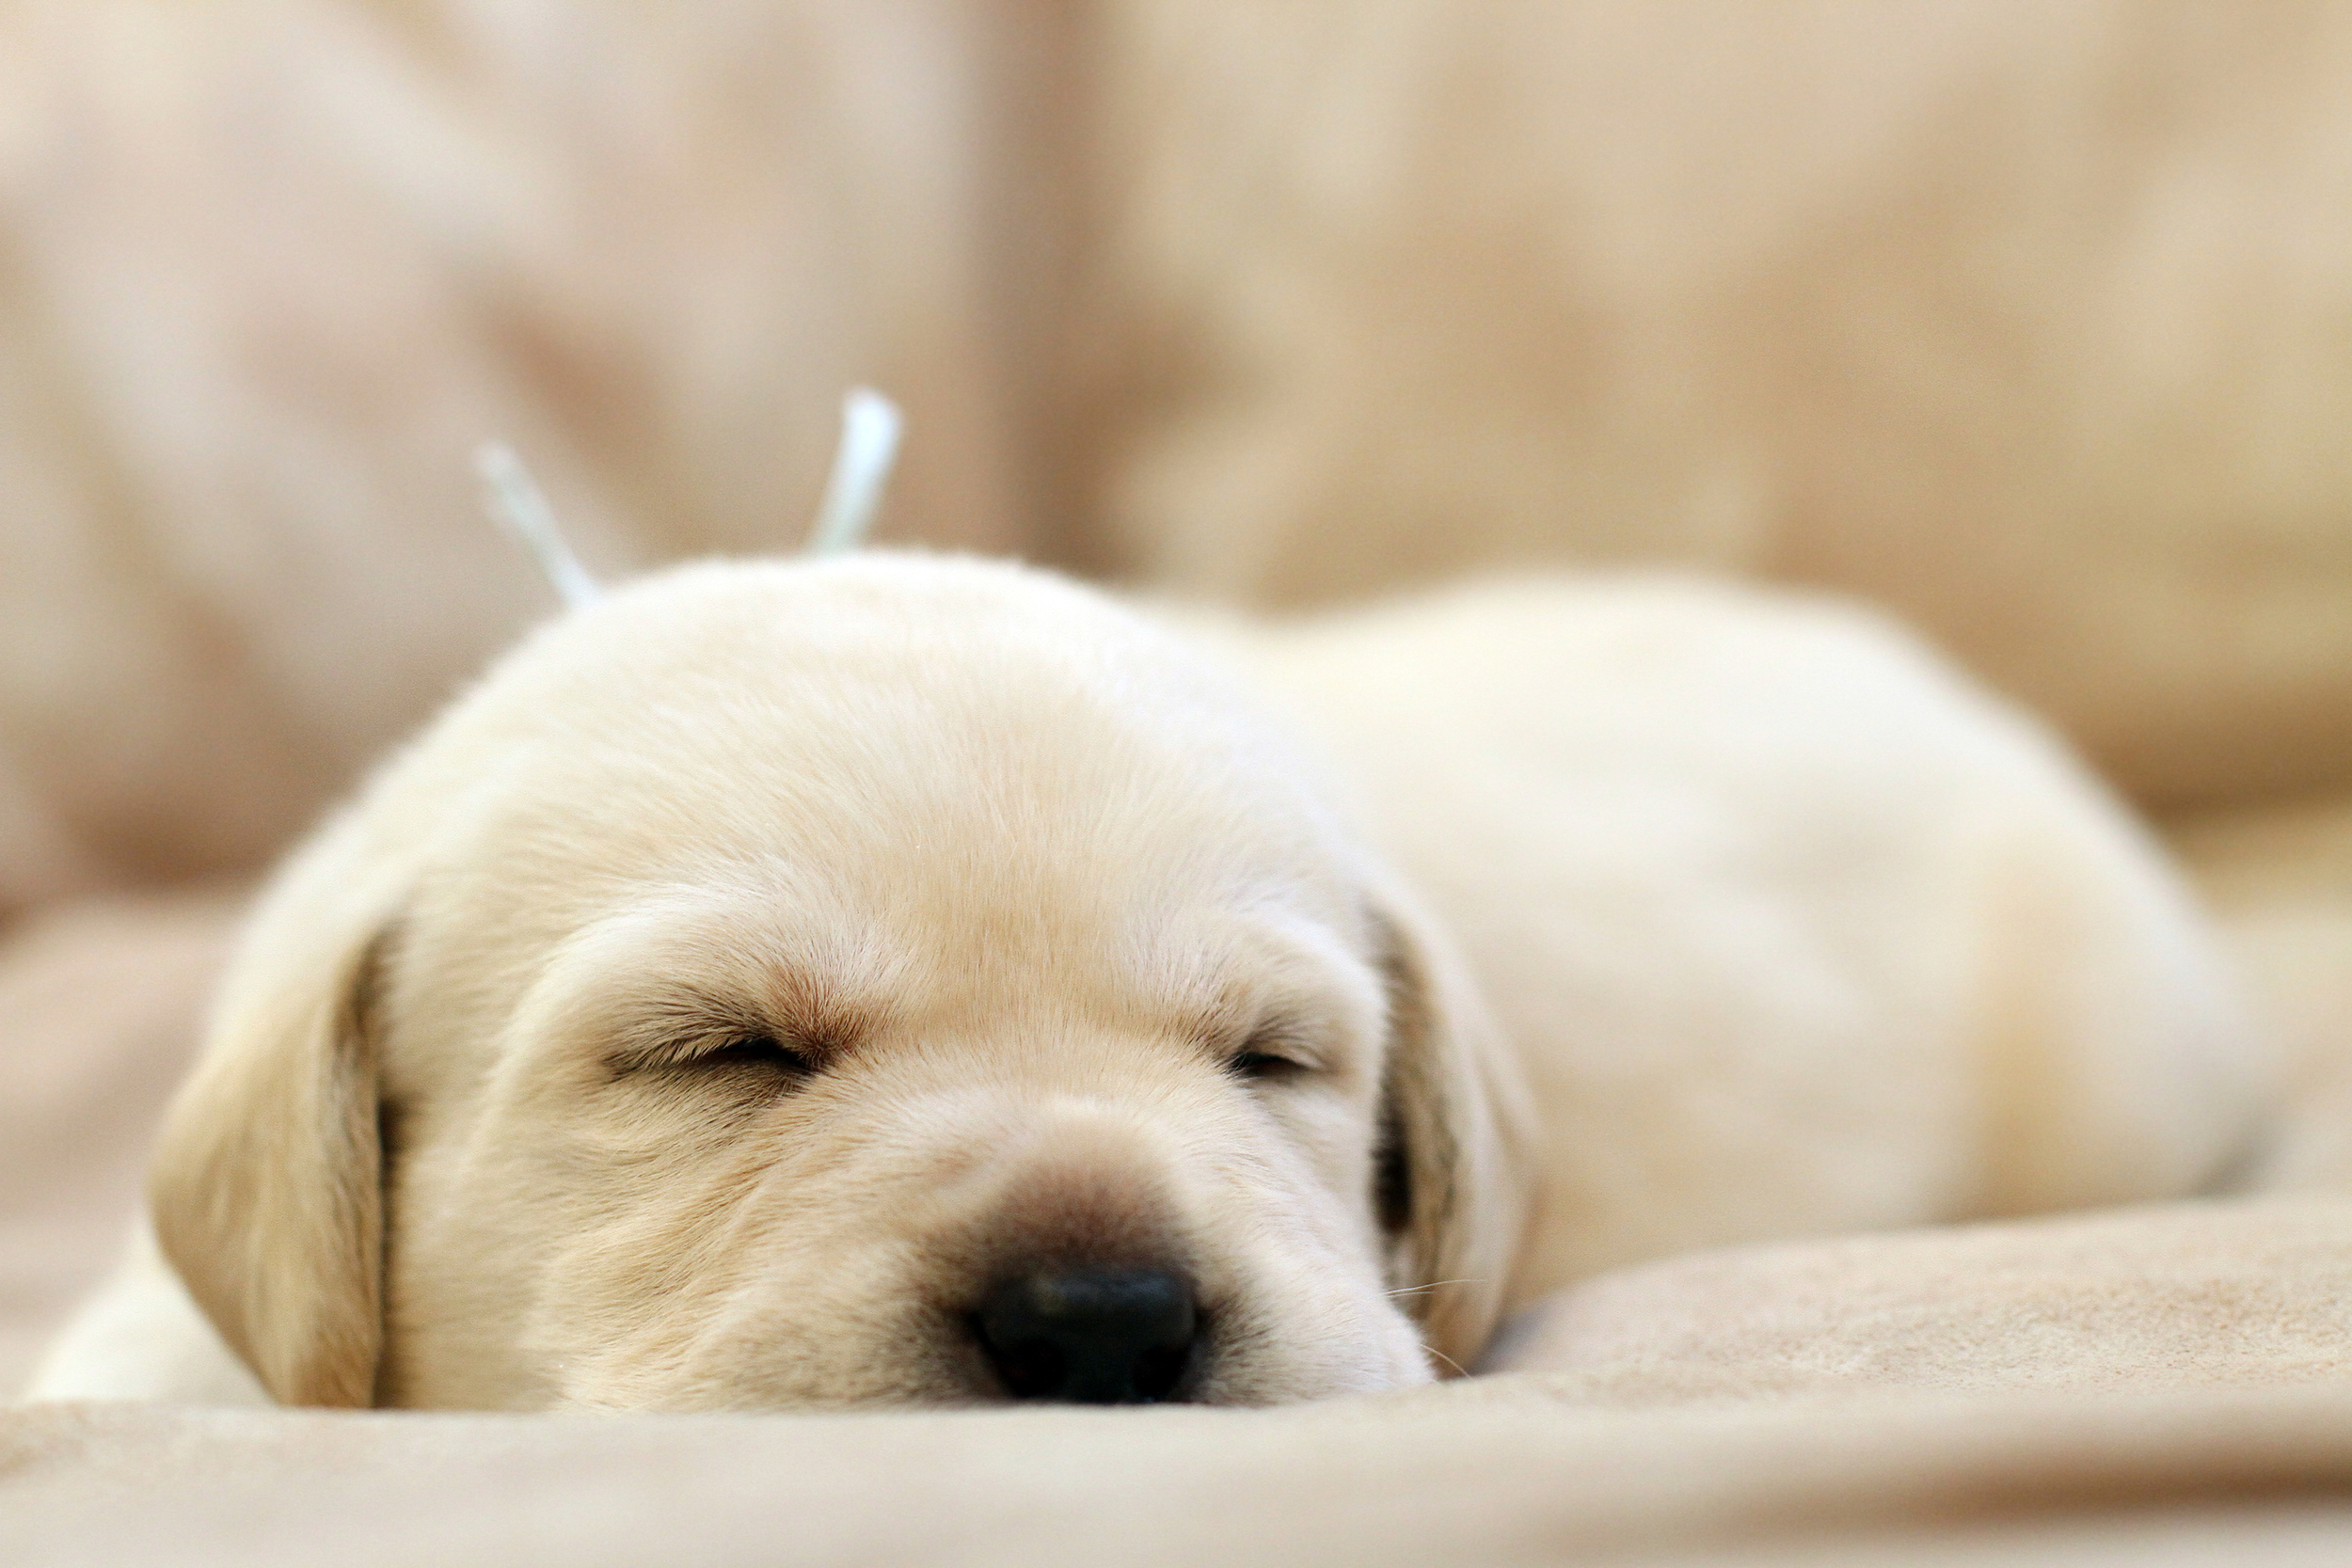 bigstock-Sweet-Yellow-Labrador-Puppy-Po-54292982.jpg